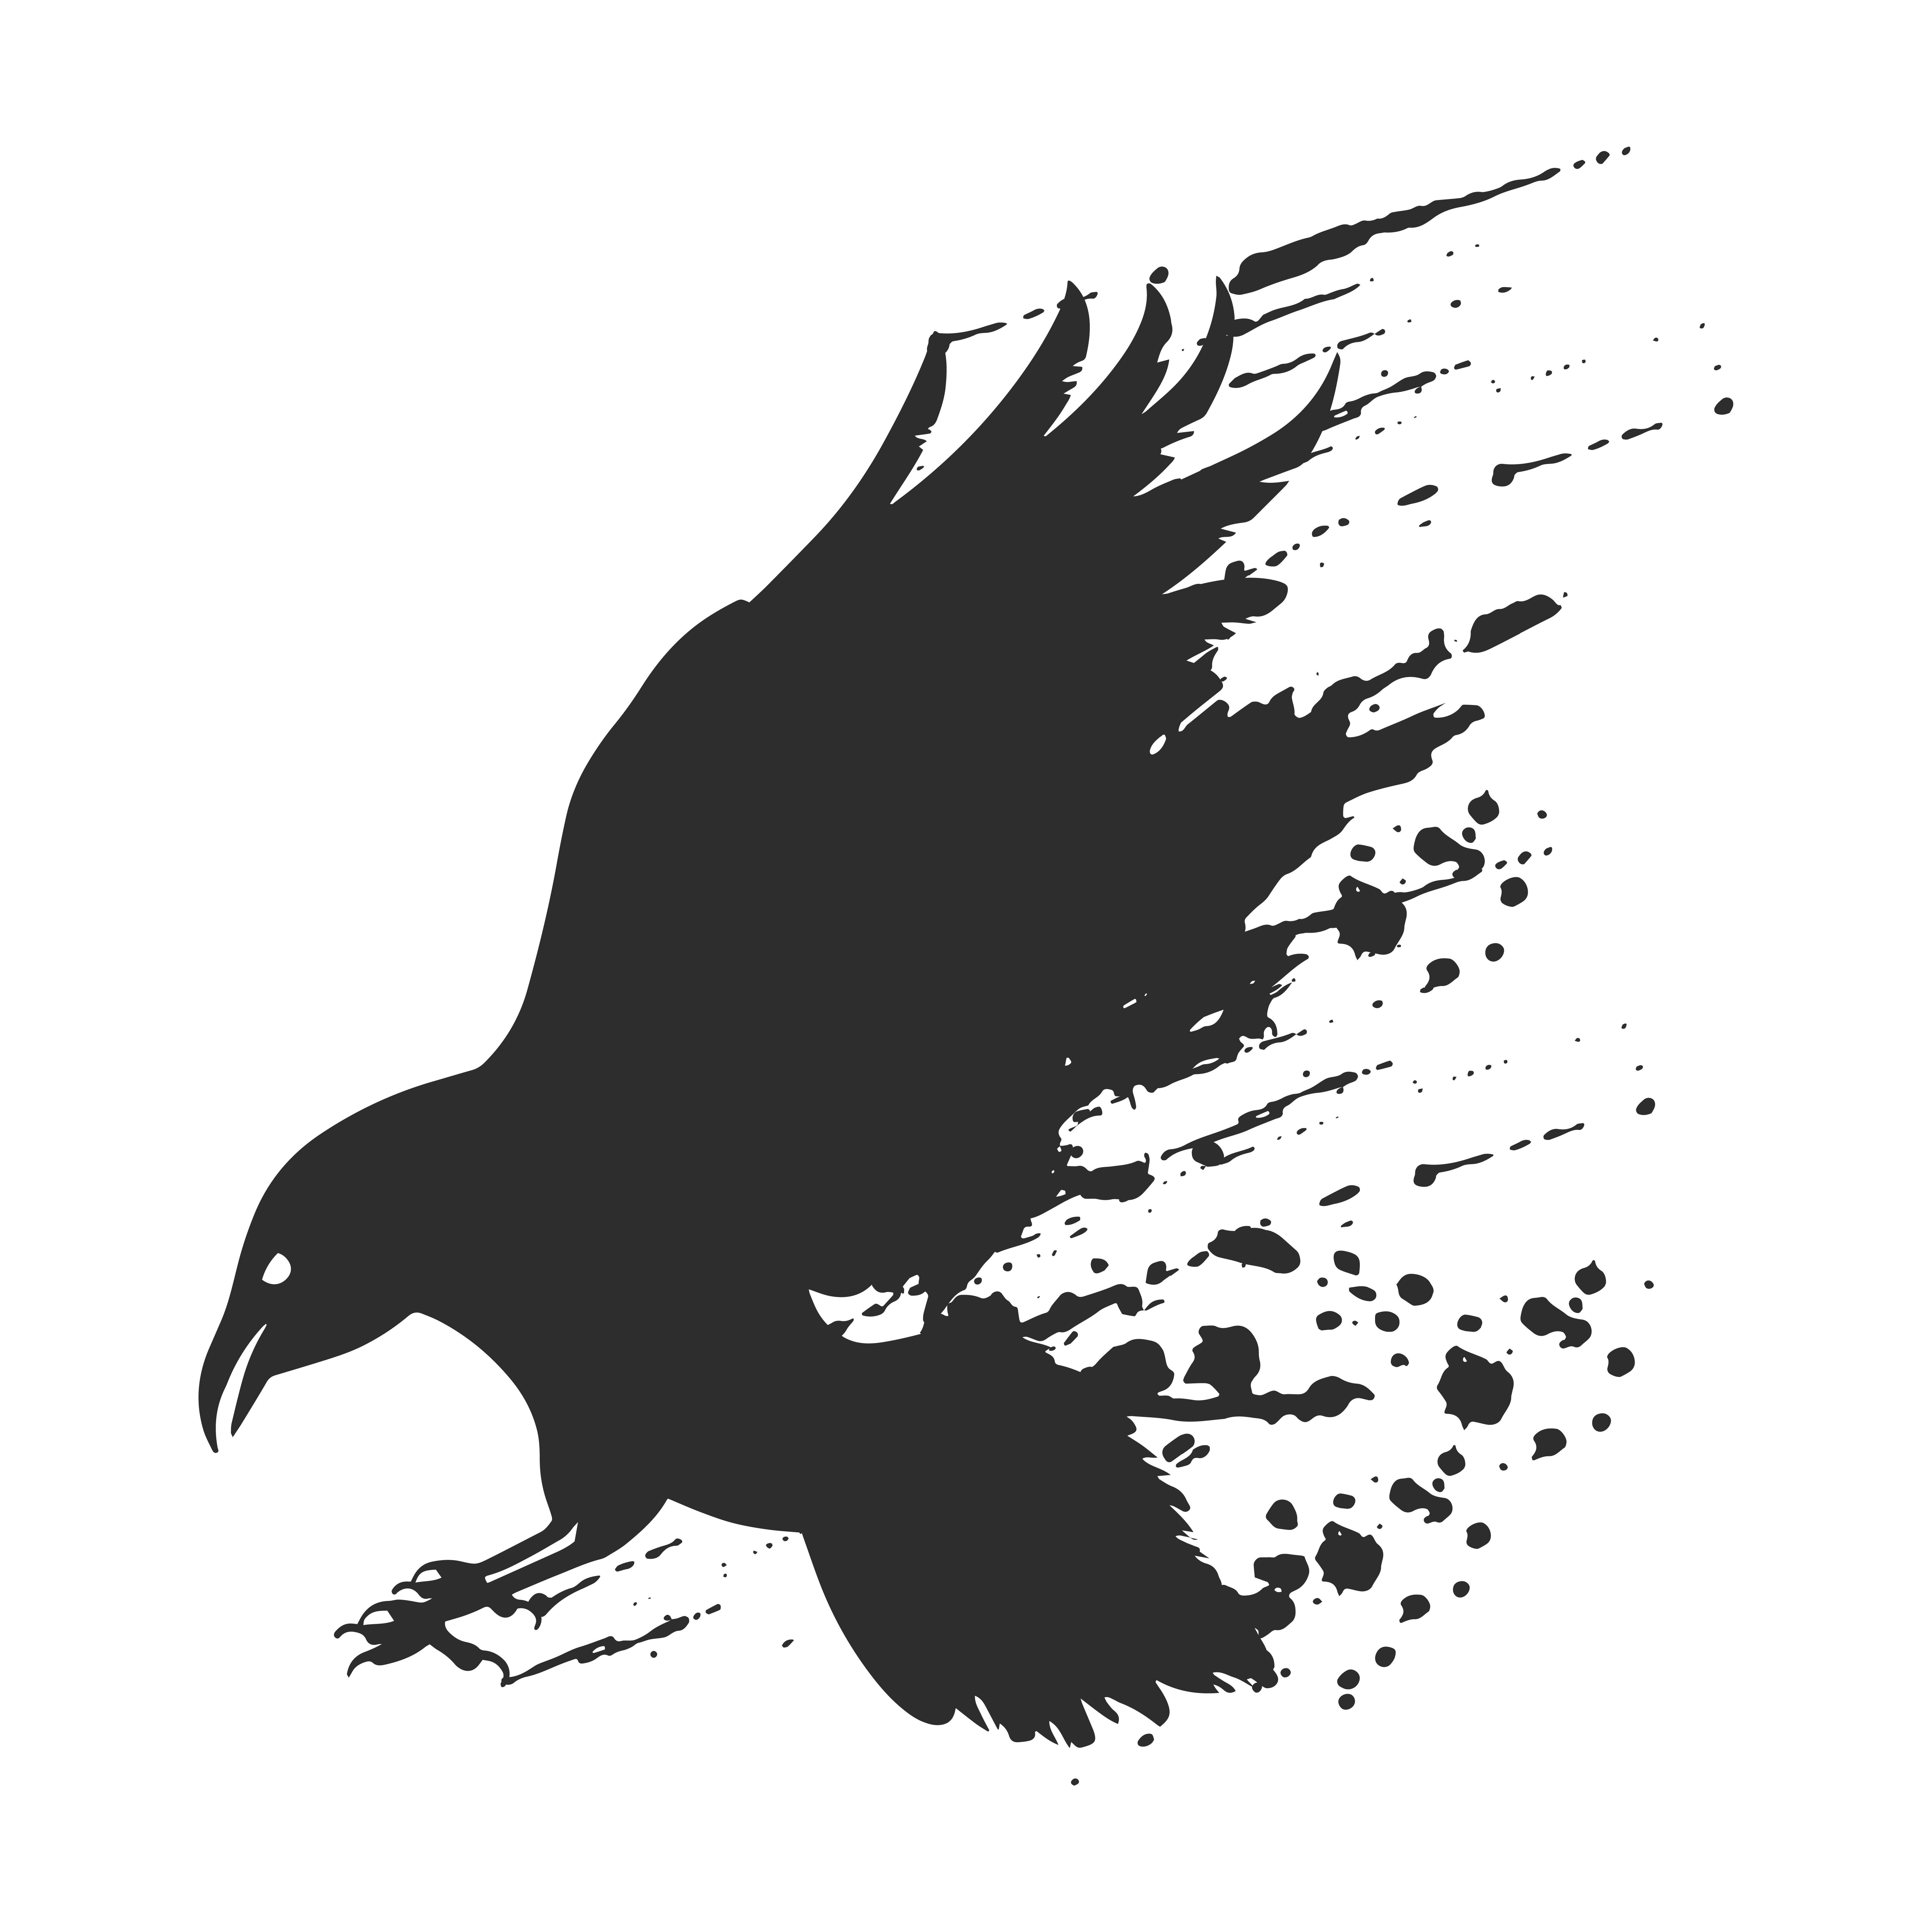 Create a logo for a small publisher, Harbinger Press